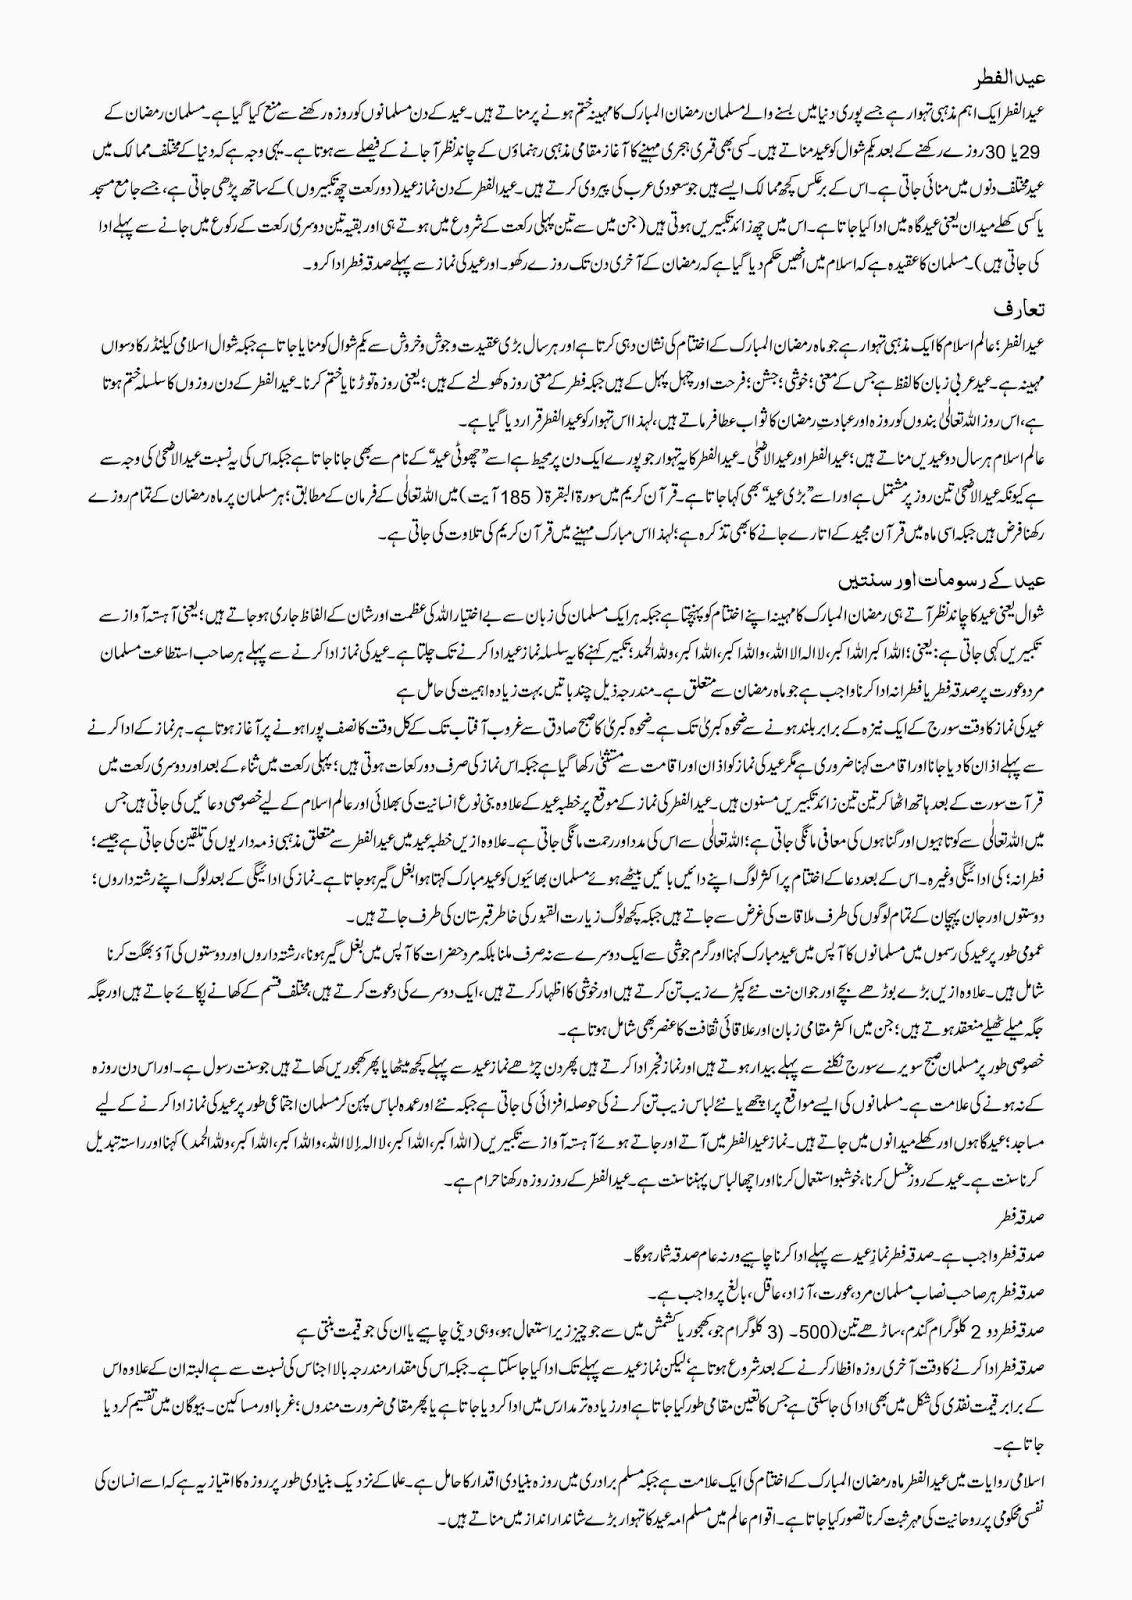 002 Essay Example Eid2bal2bfitar Mahatma Gandhi In Imposing Urdu Language Jayanti Speech Full